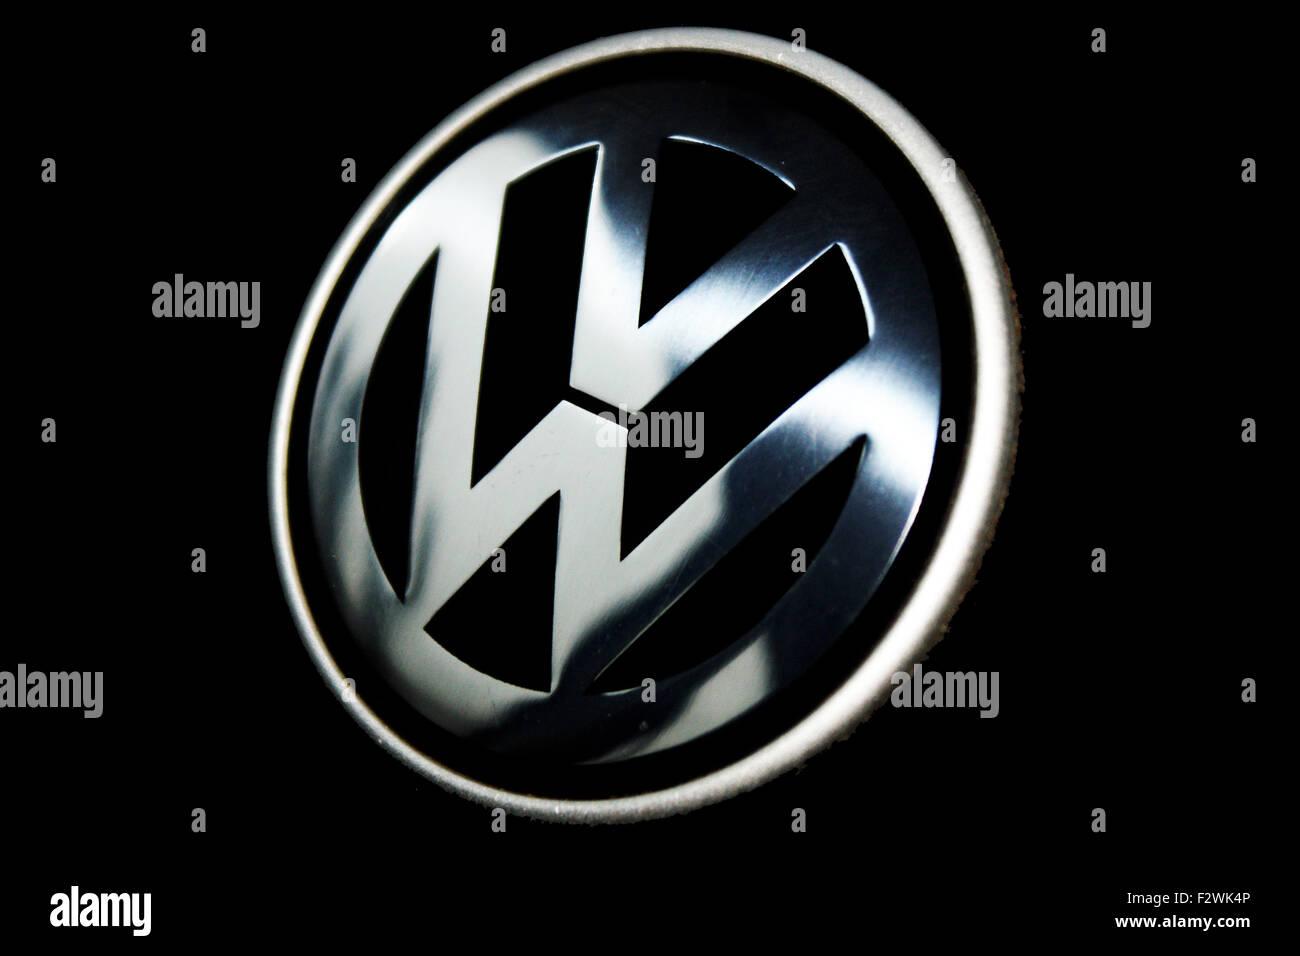 Volkswagen logo VW - Stock Image